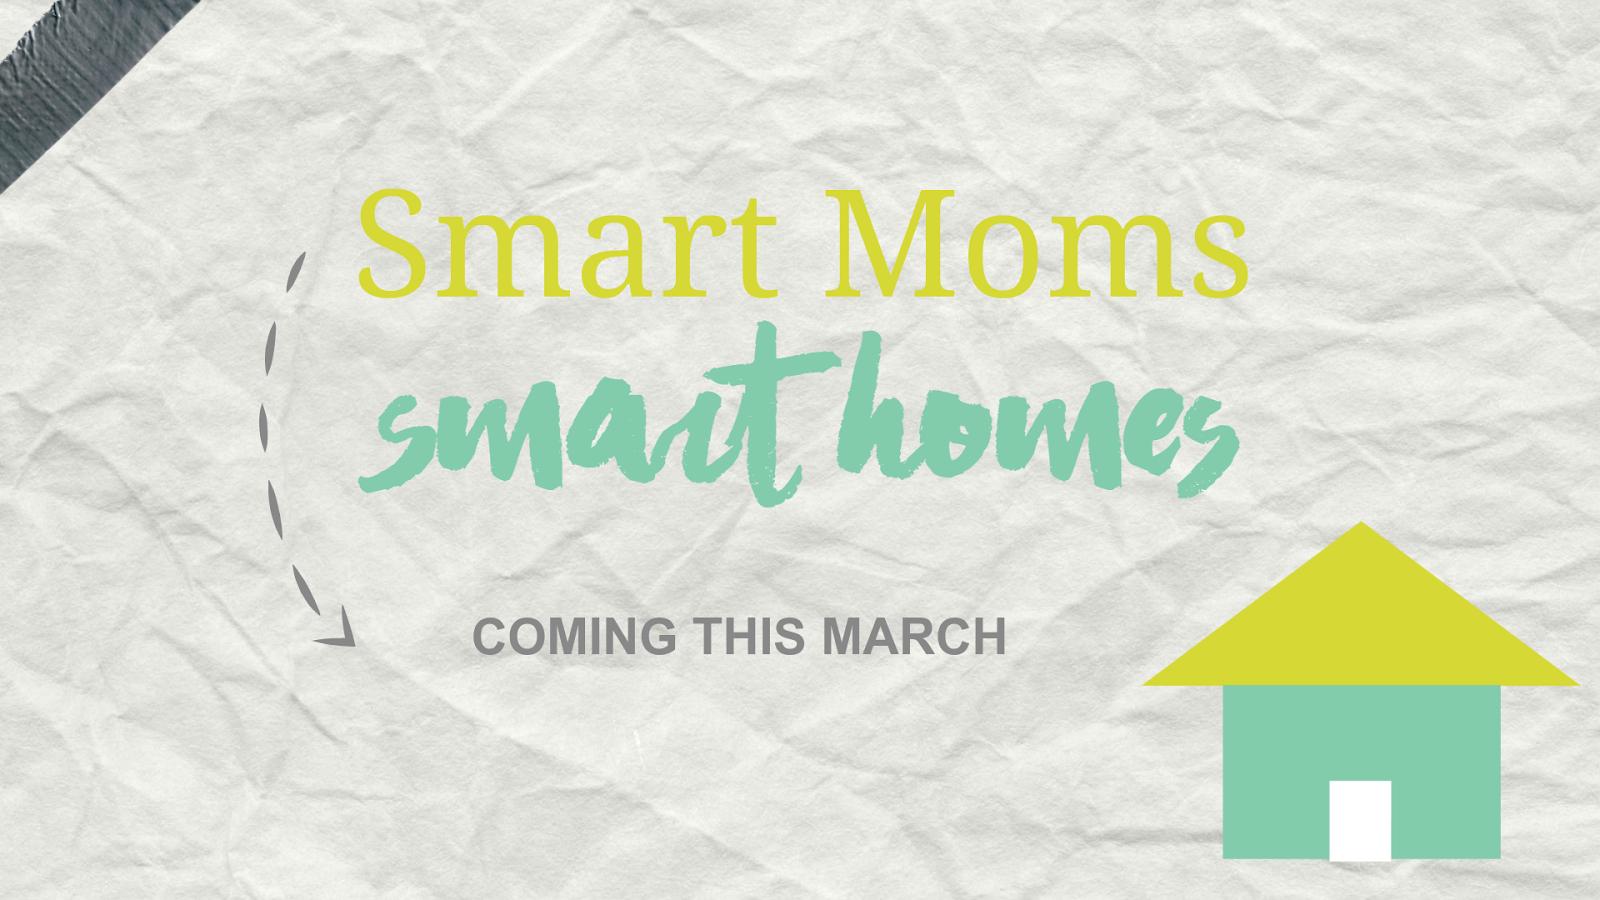 Smart Moms, Smart Homes